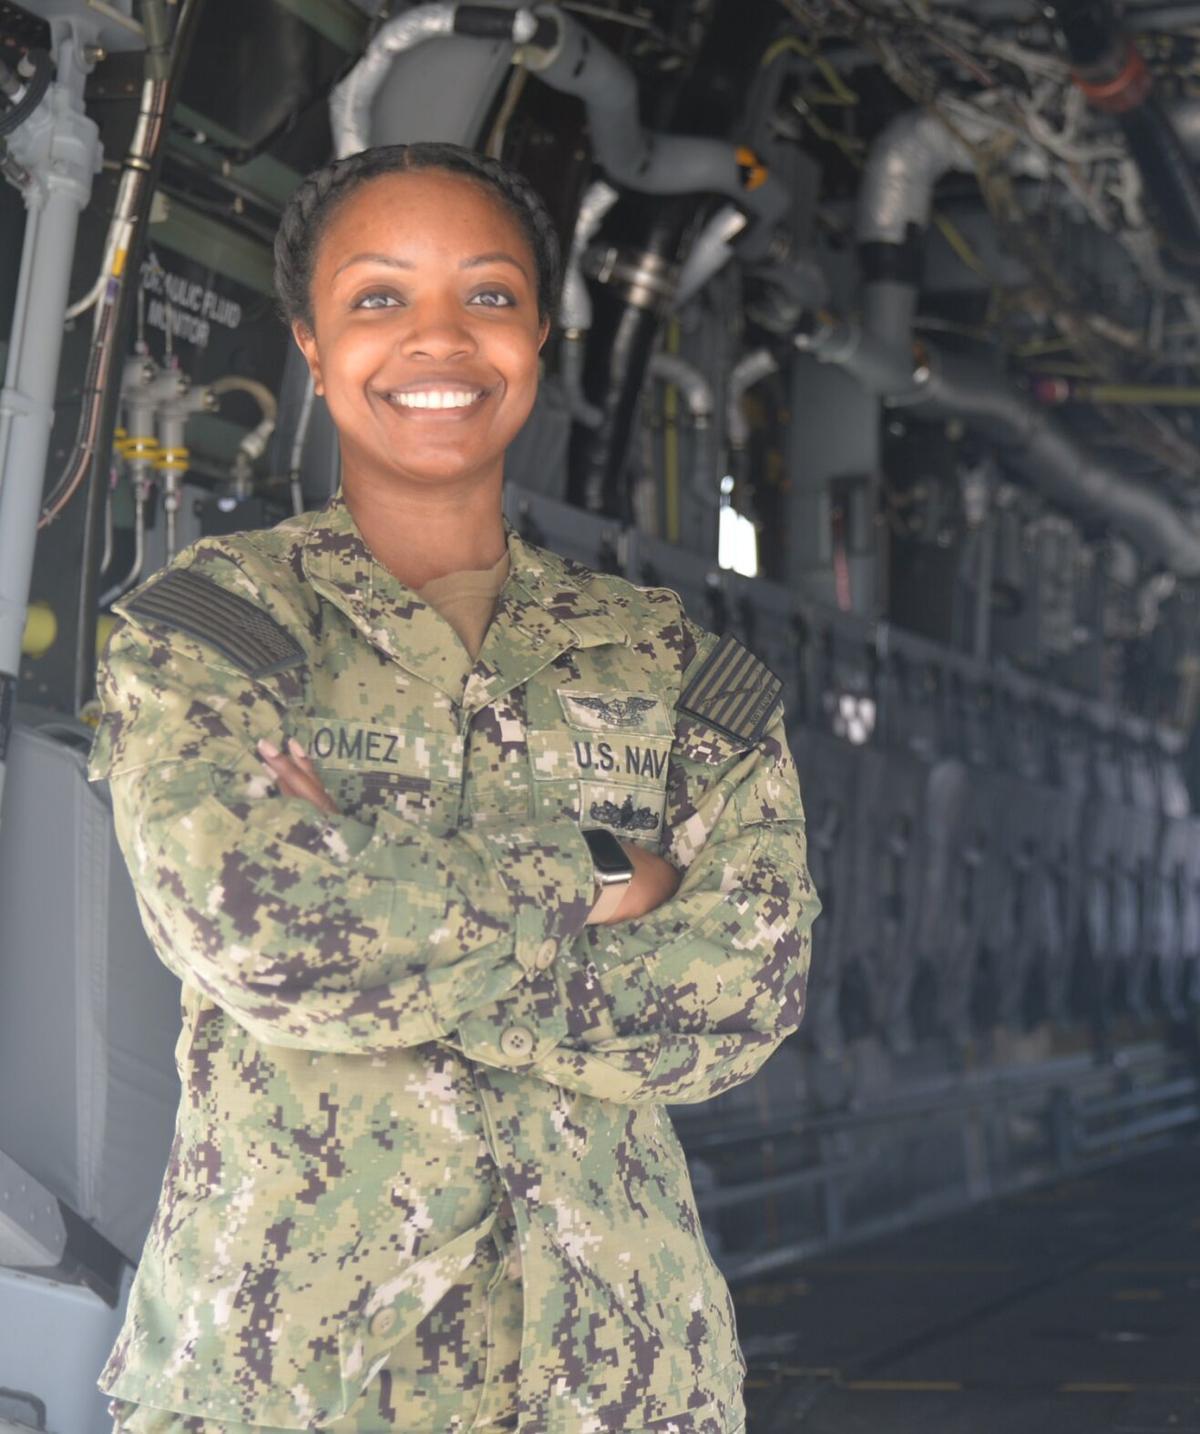 091221-ent-navy-p1